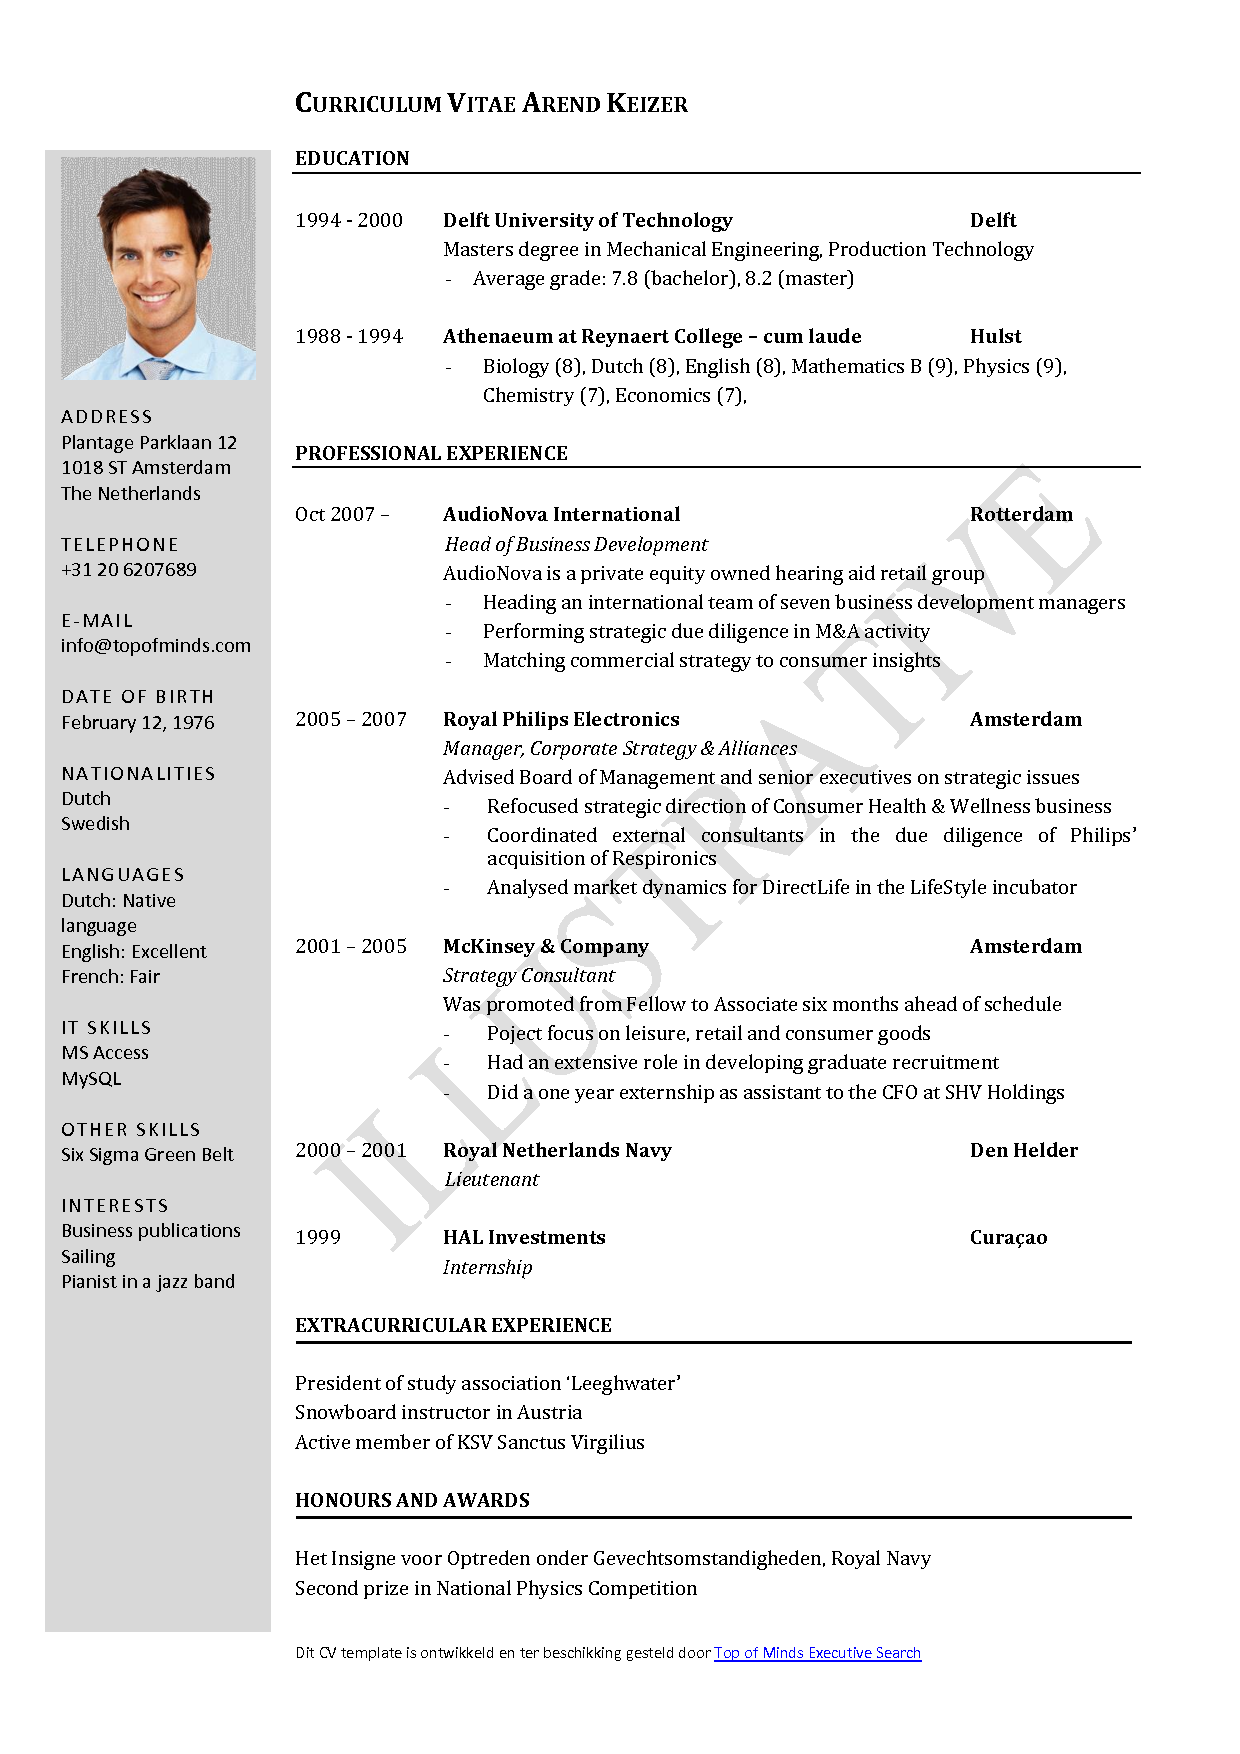 Curriculum Vitae Template Pdf South Africa